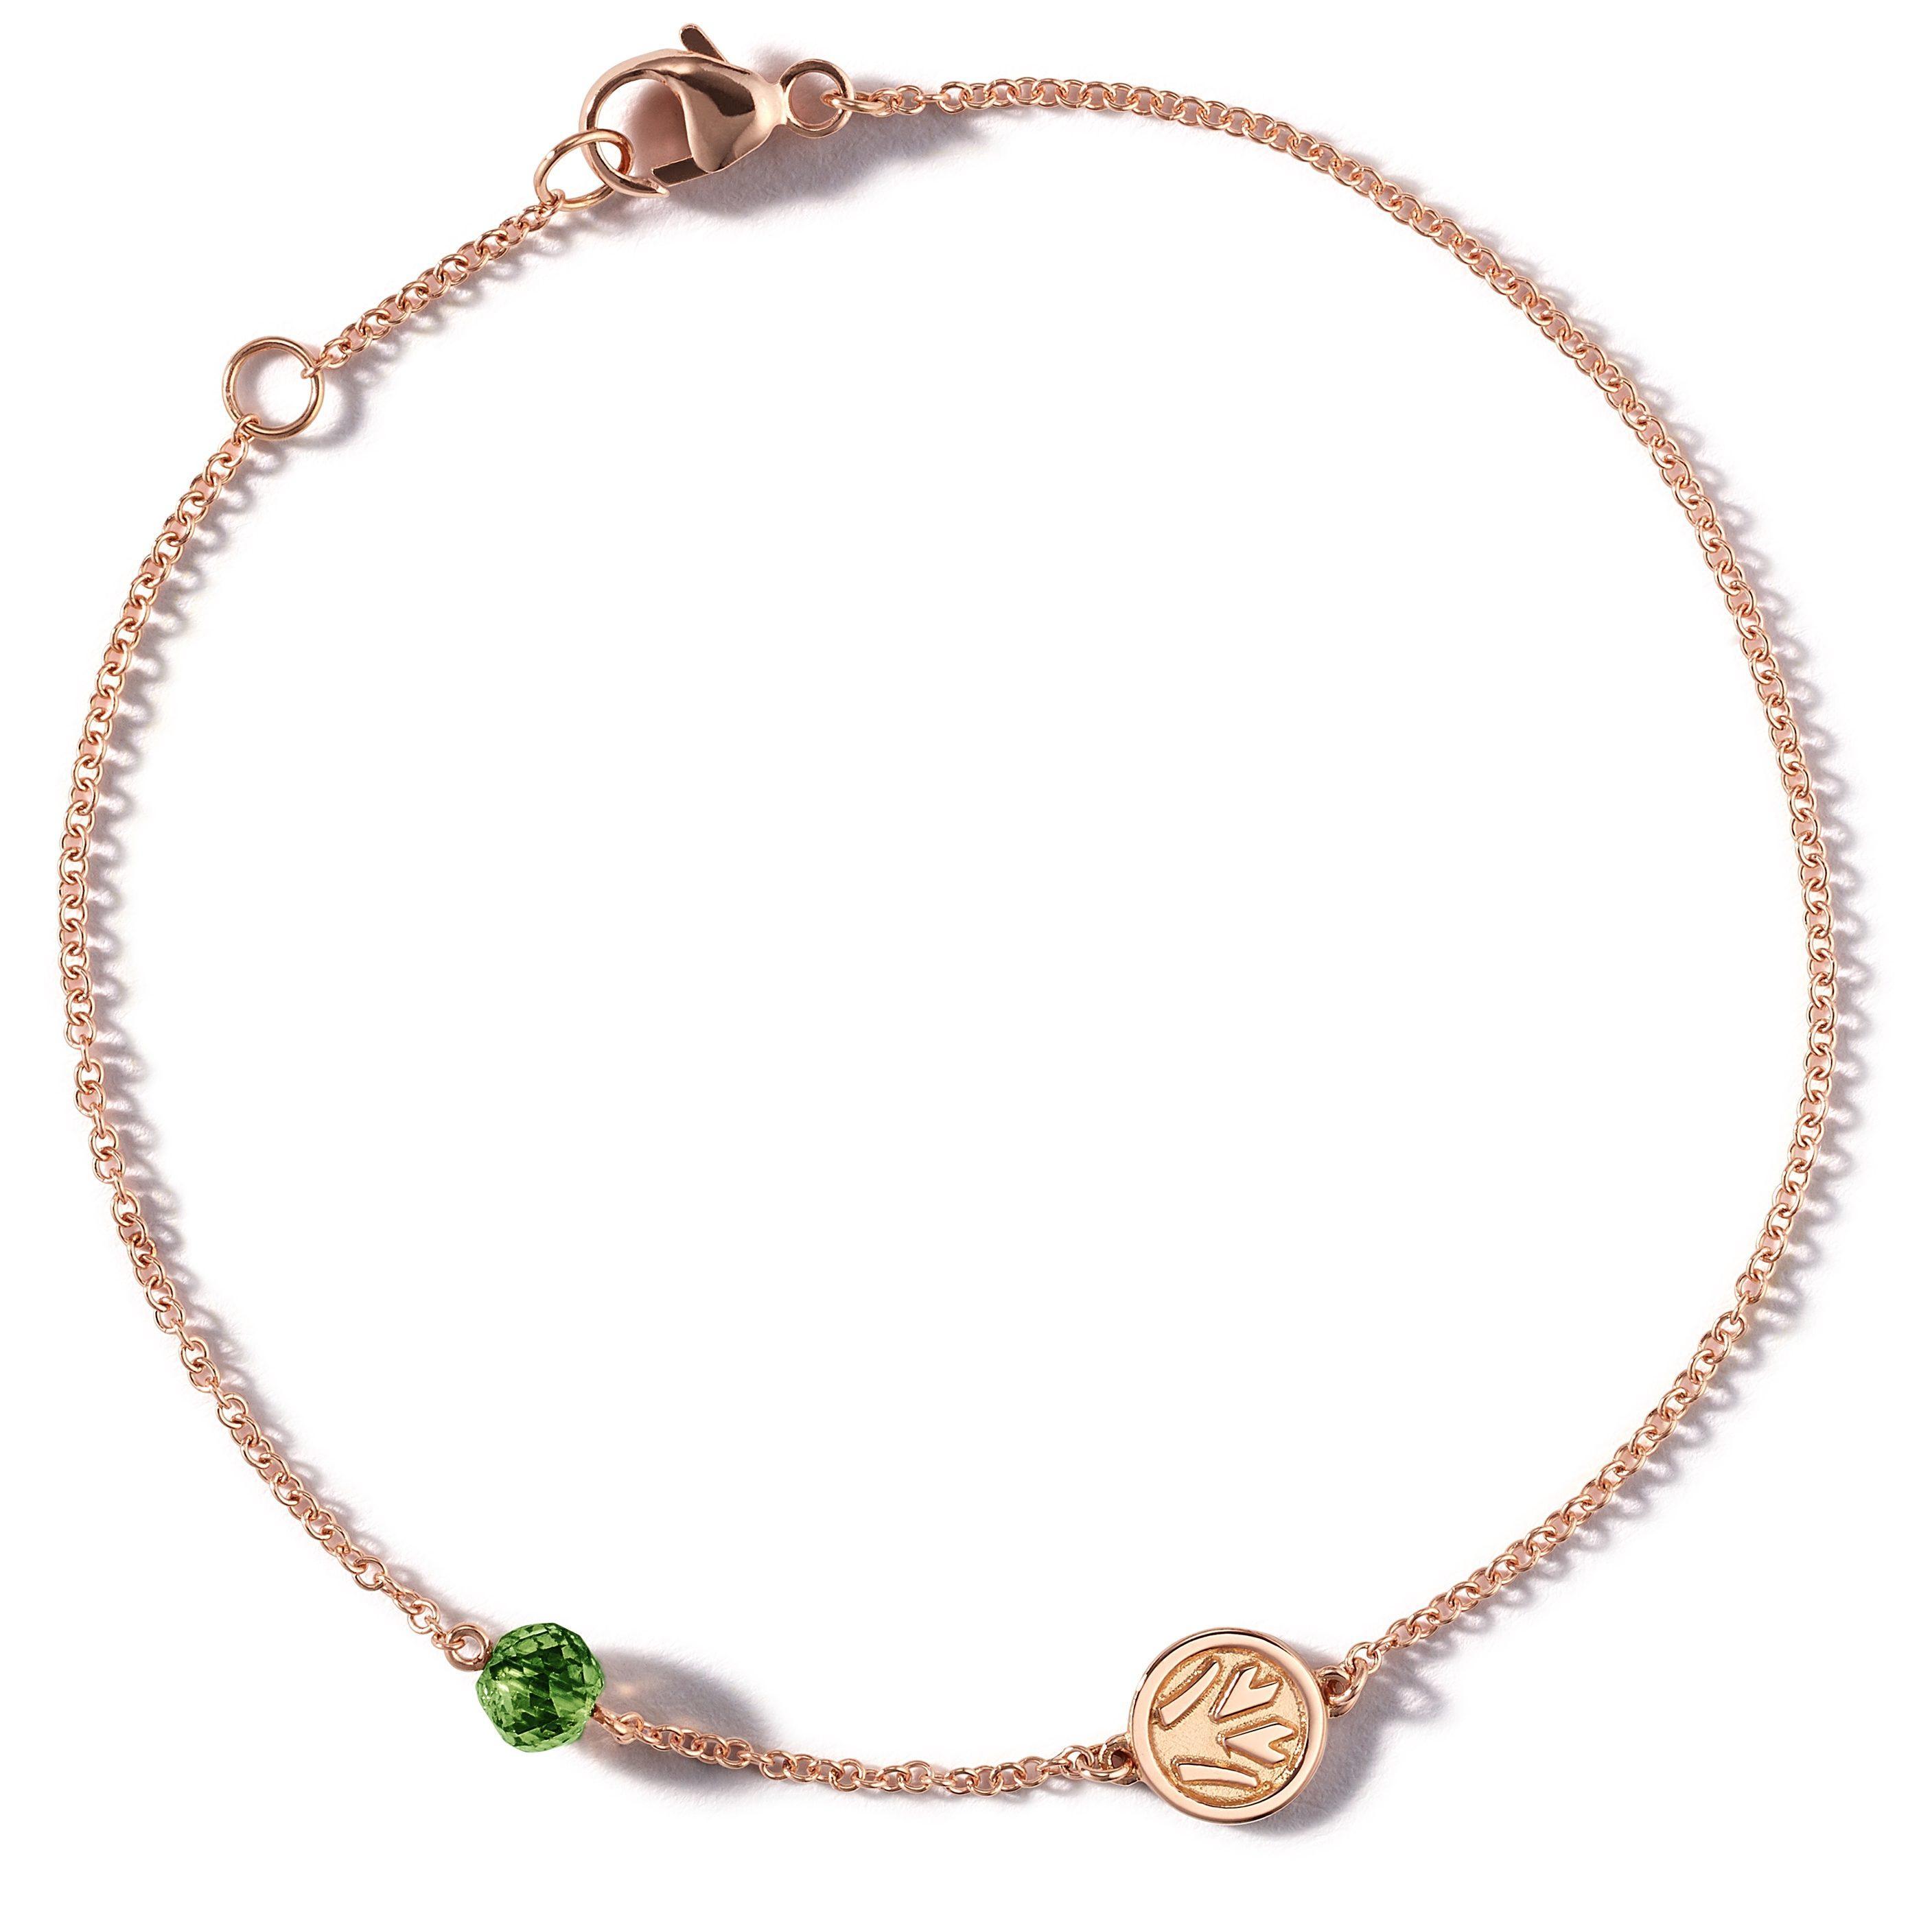 Nina Runsdorf Rose Gold Tree Of Life Bracelet with Green Bead